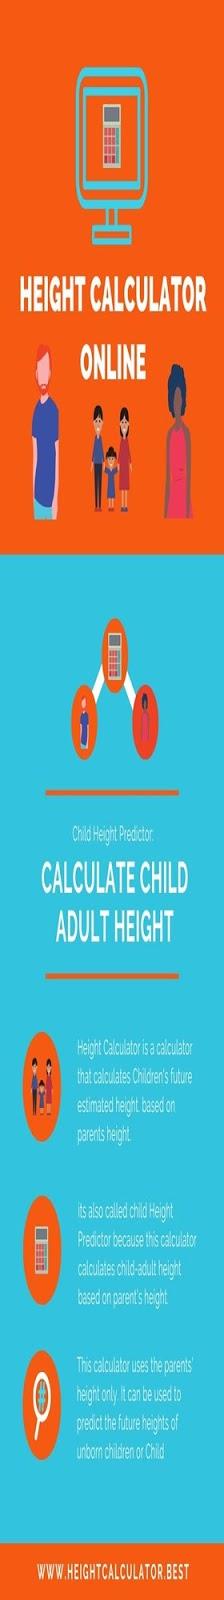 Height Calculator Infographic